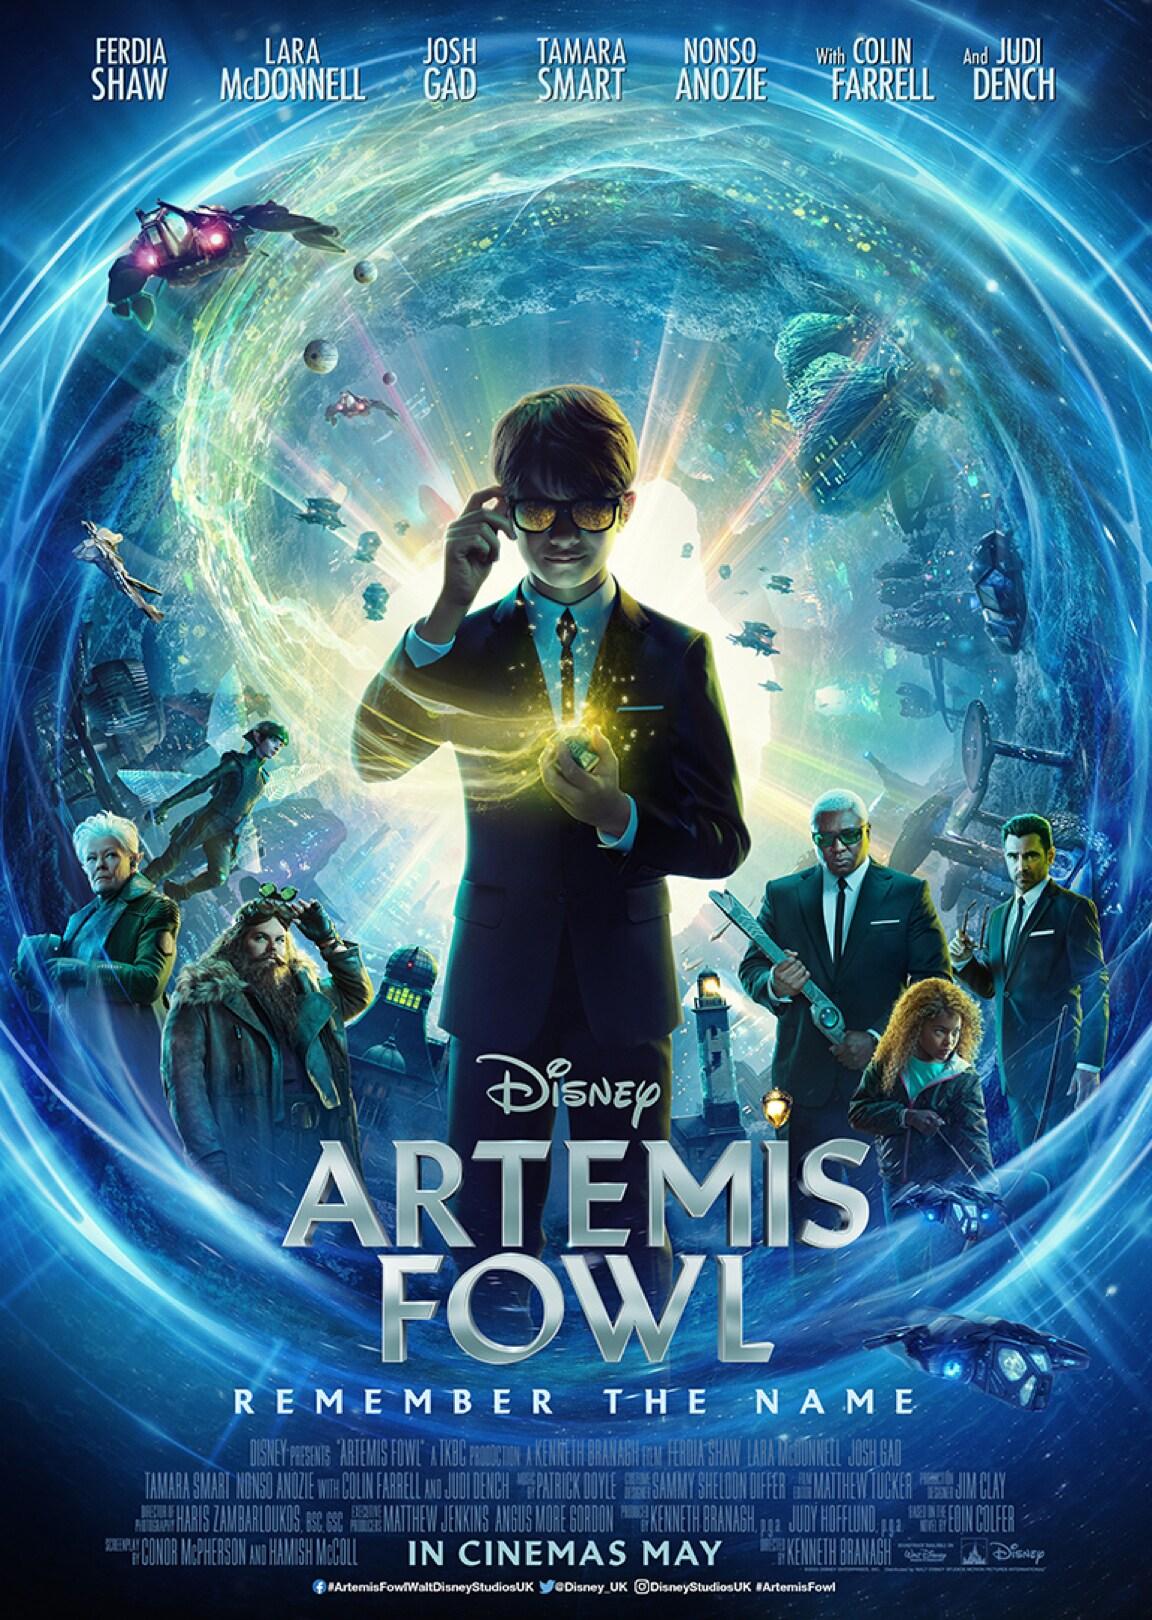 Close up of Artemis Fowl wearing sunglasses.